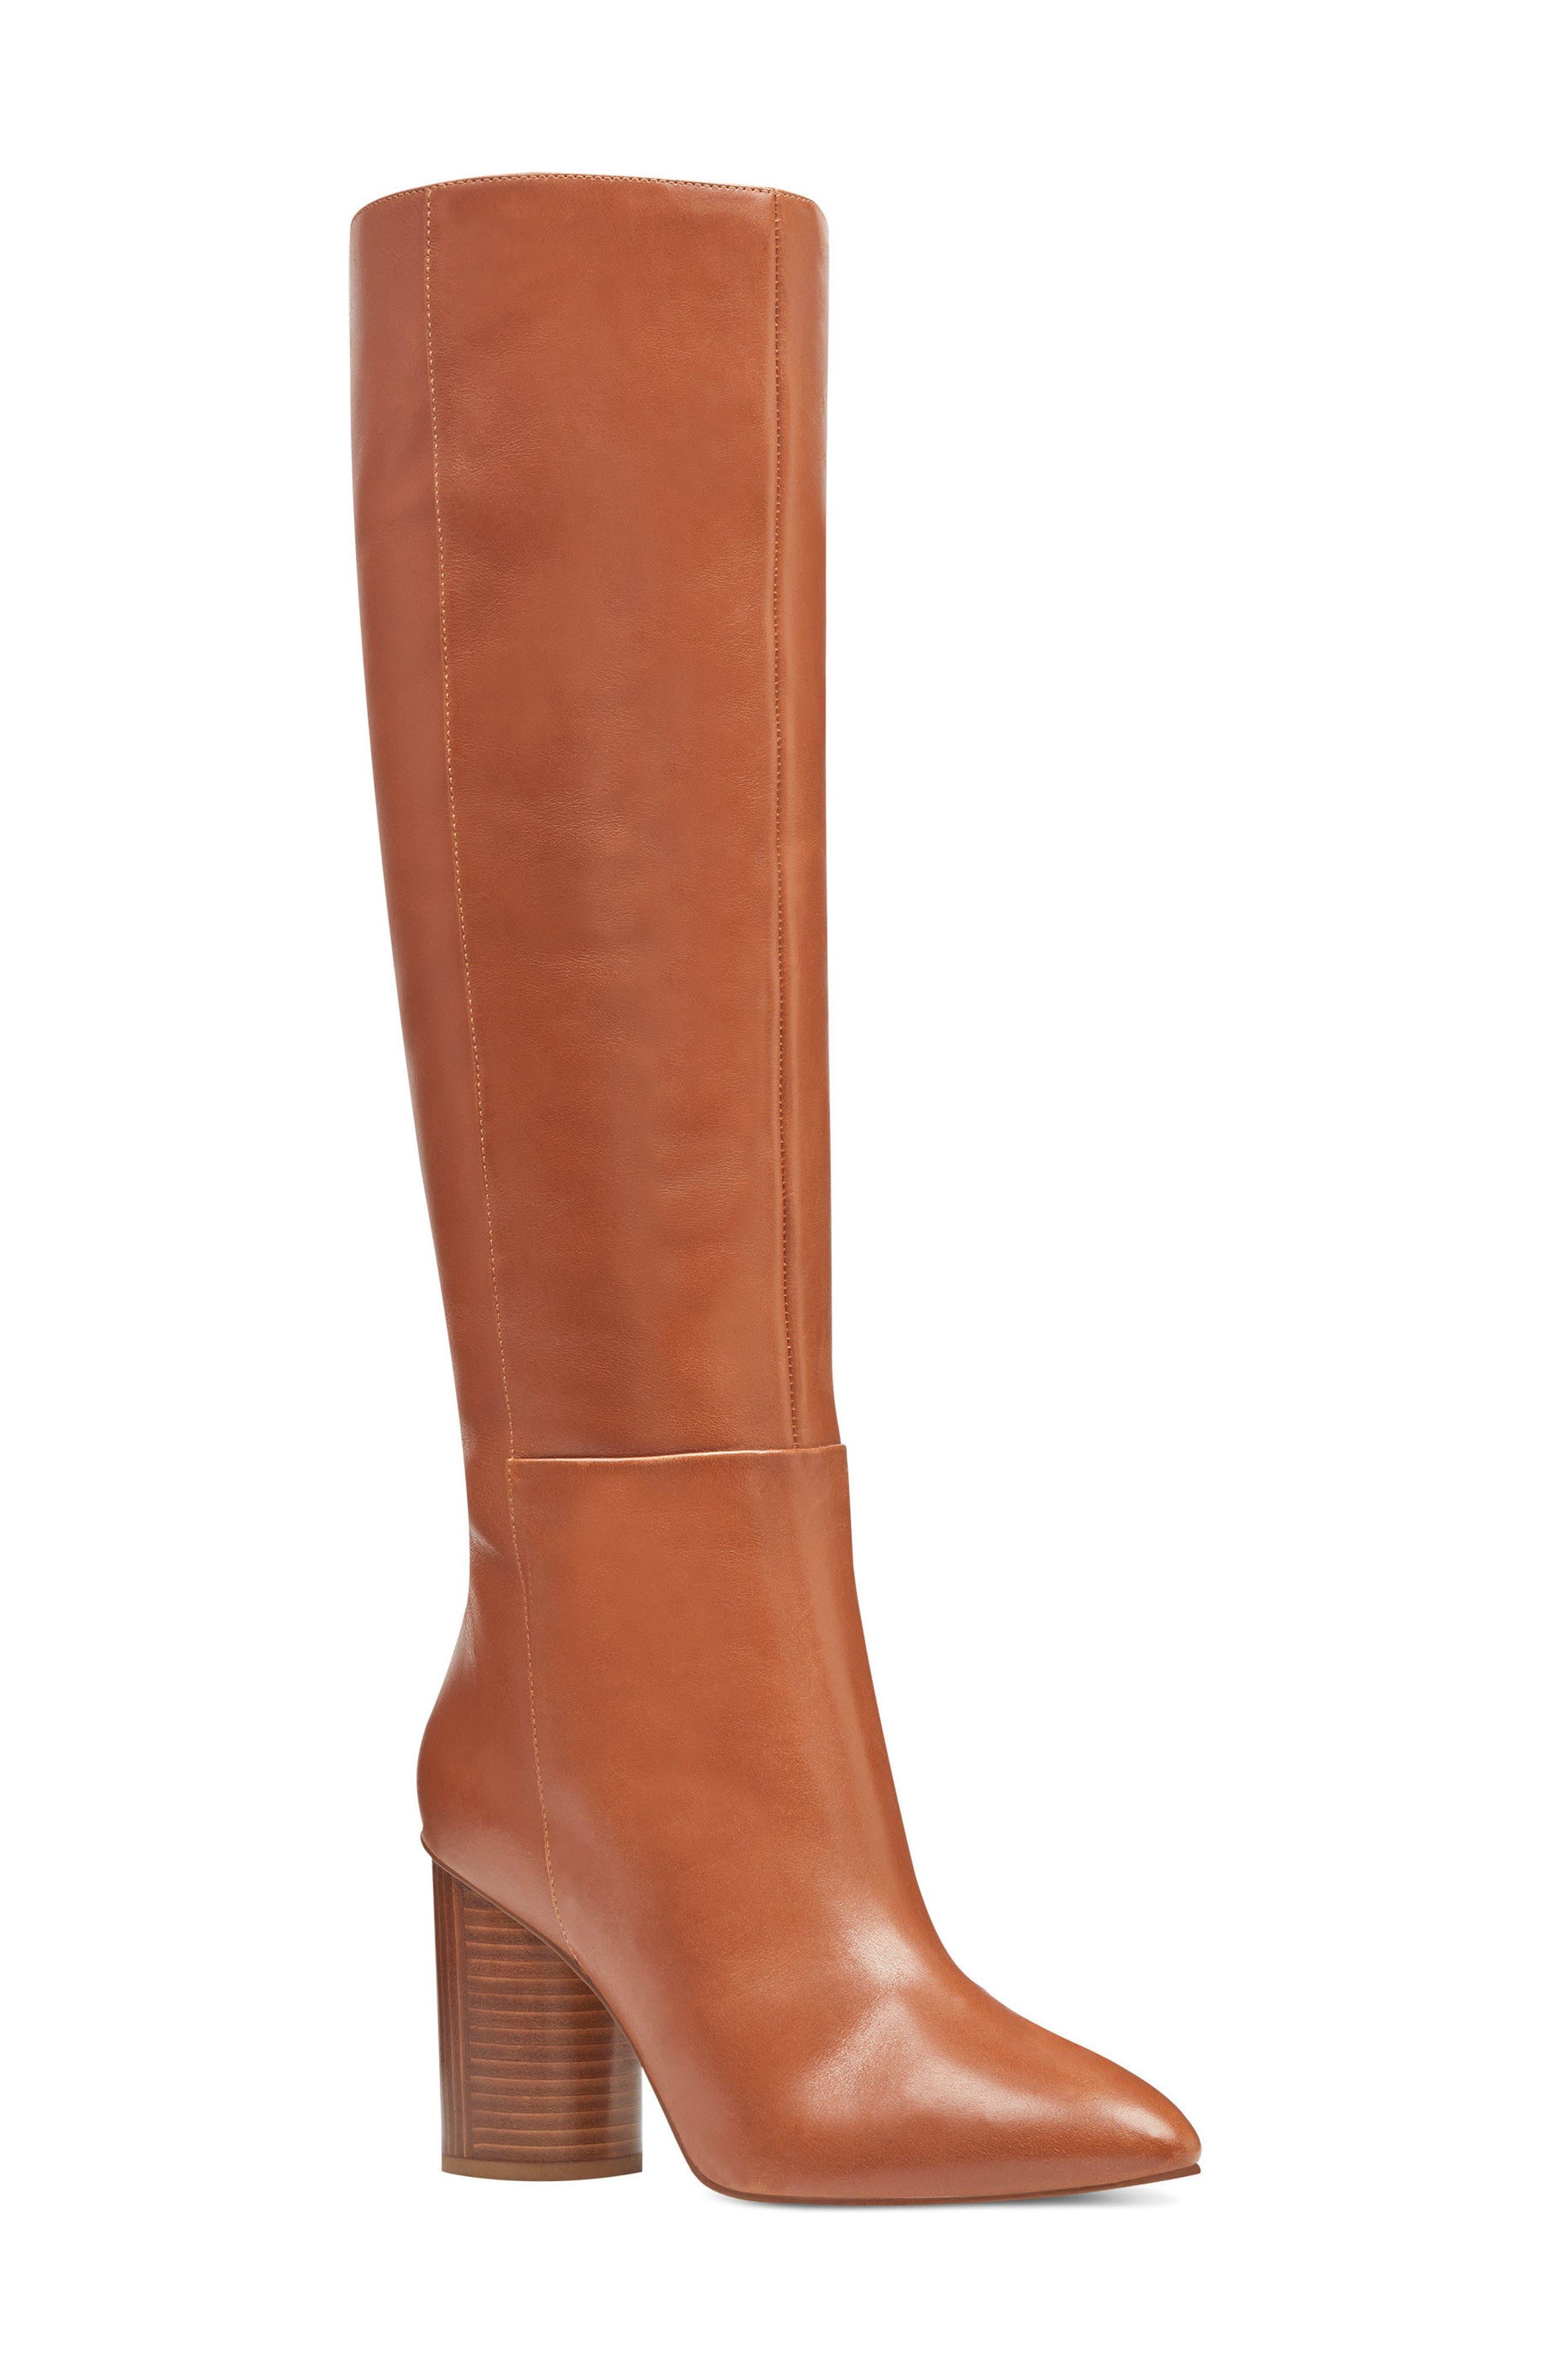 Main Image - Nine West Christie Knee High Boot (Women)